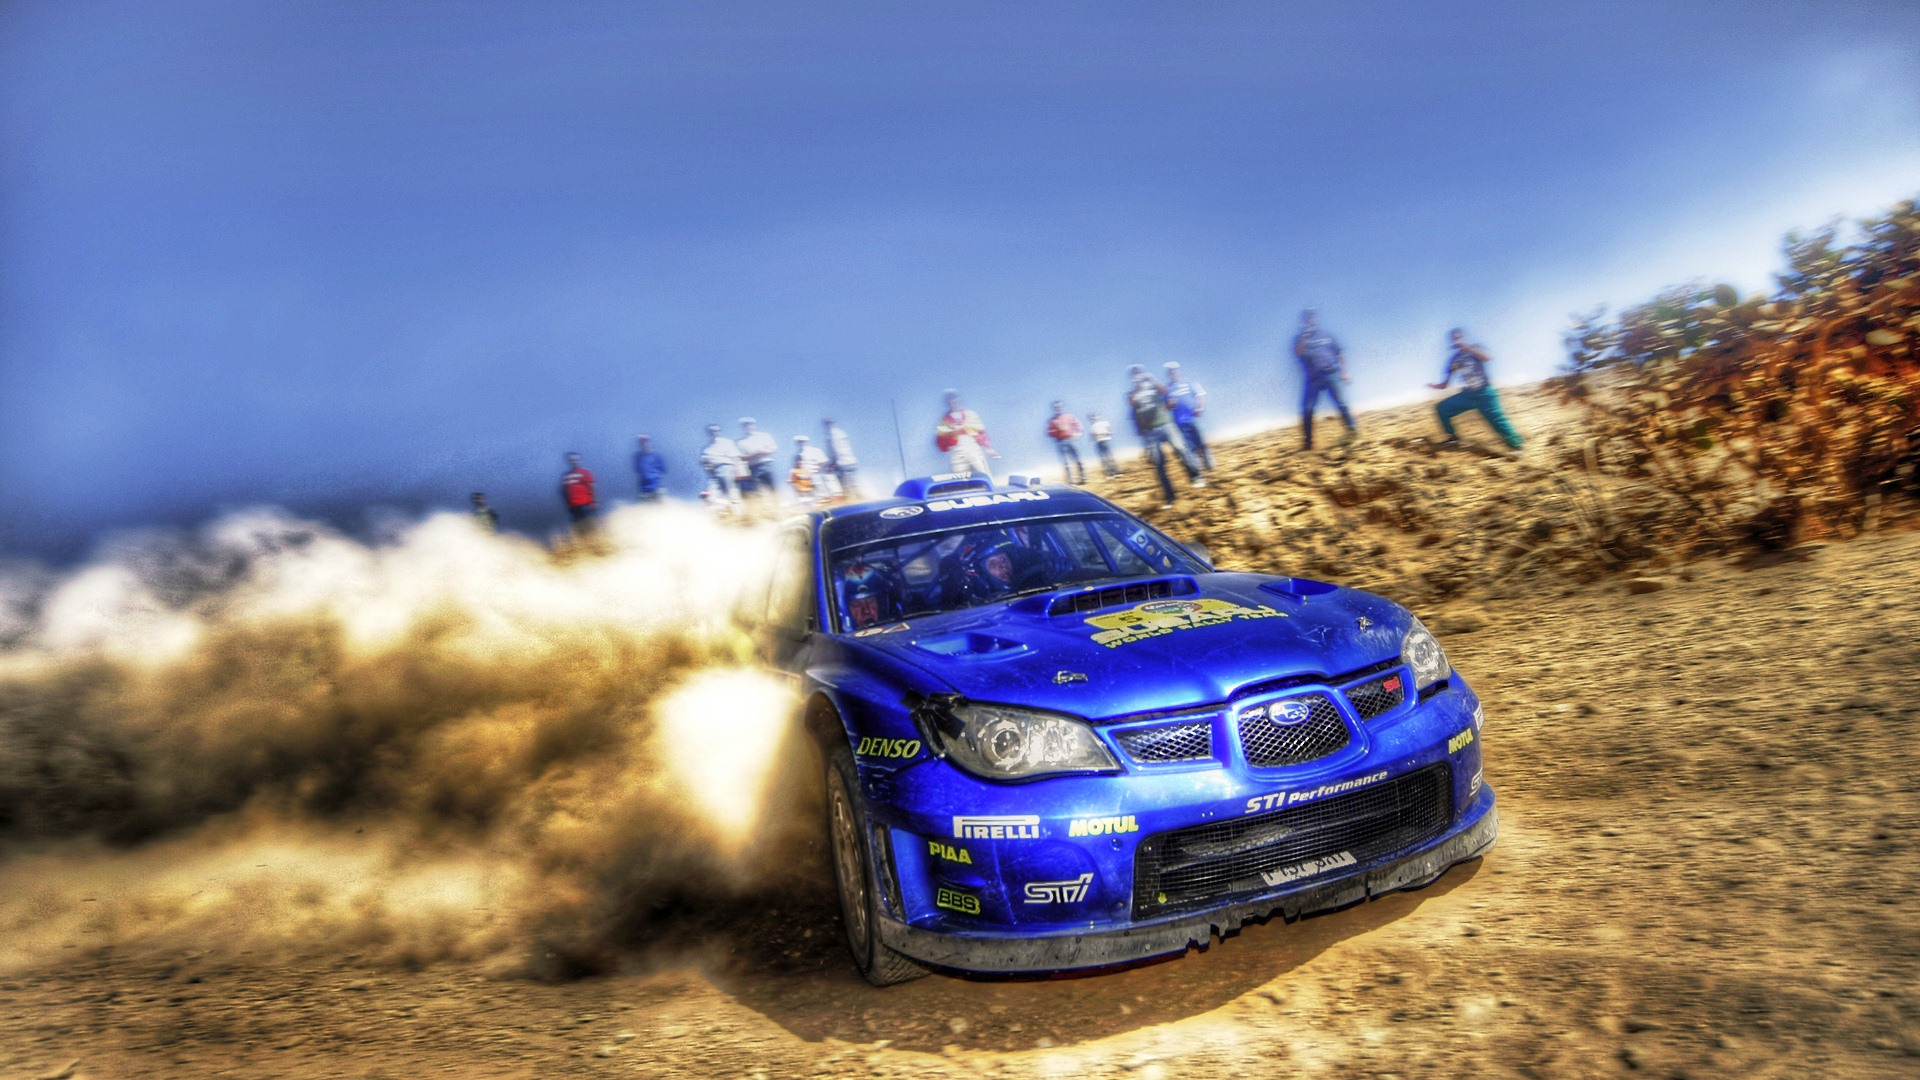 Blue Subaru Rally Car HD Wallpapers HD Wallpapers Source 1920x1080